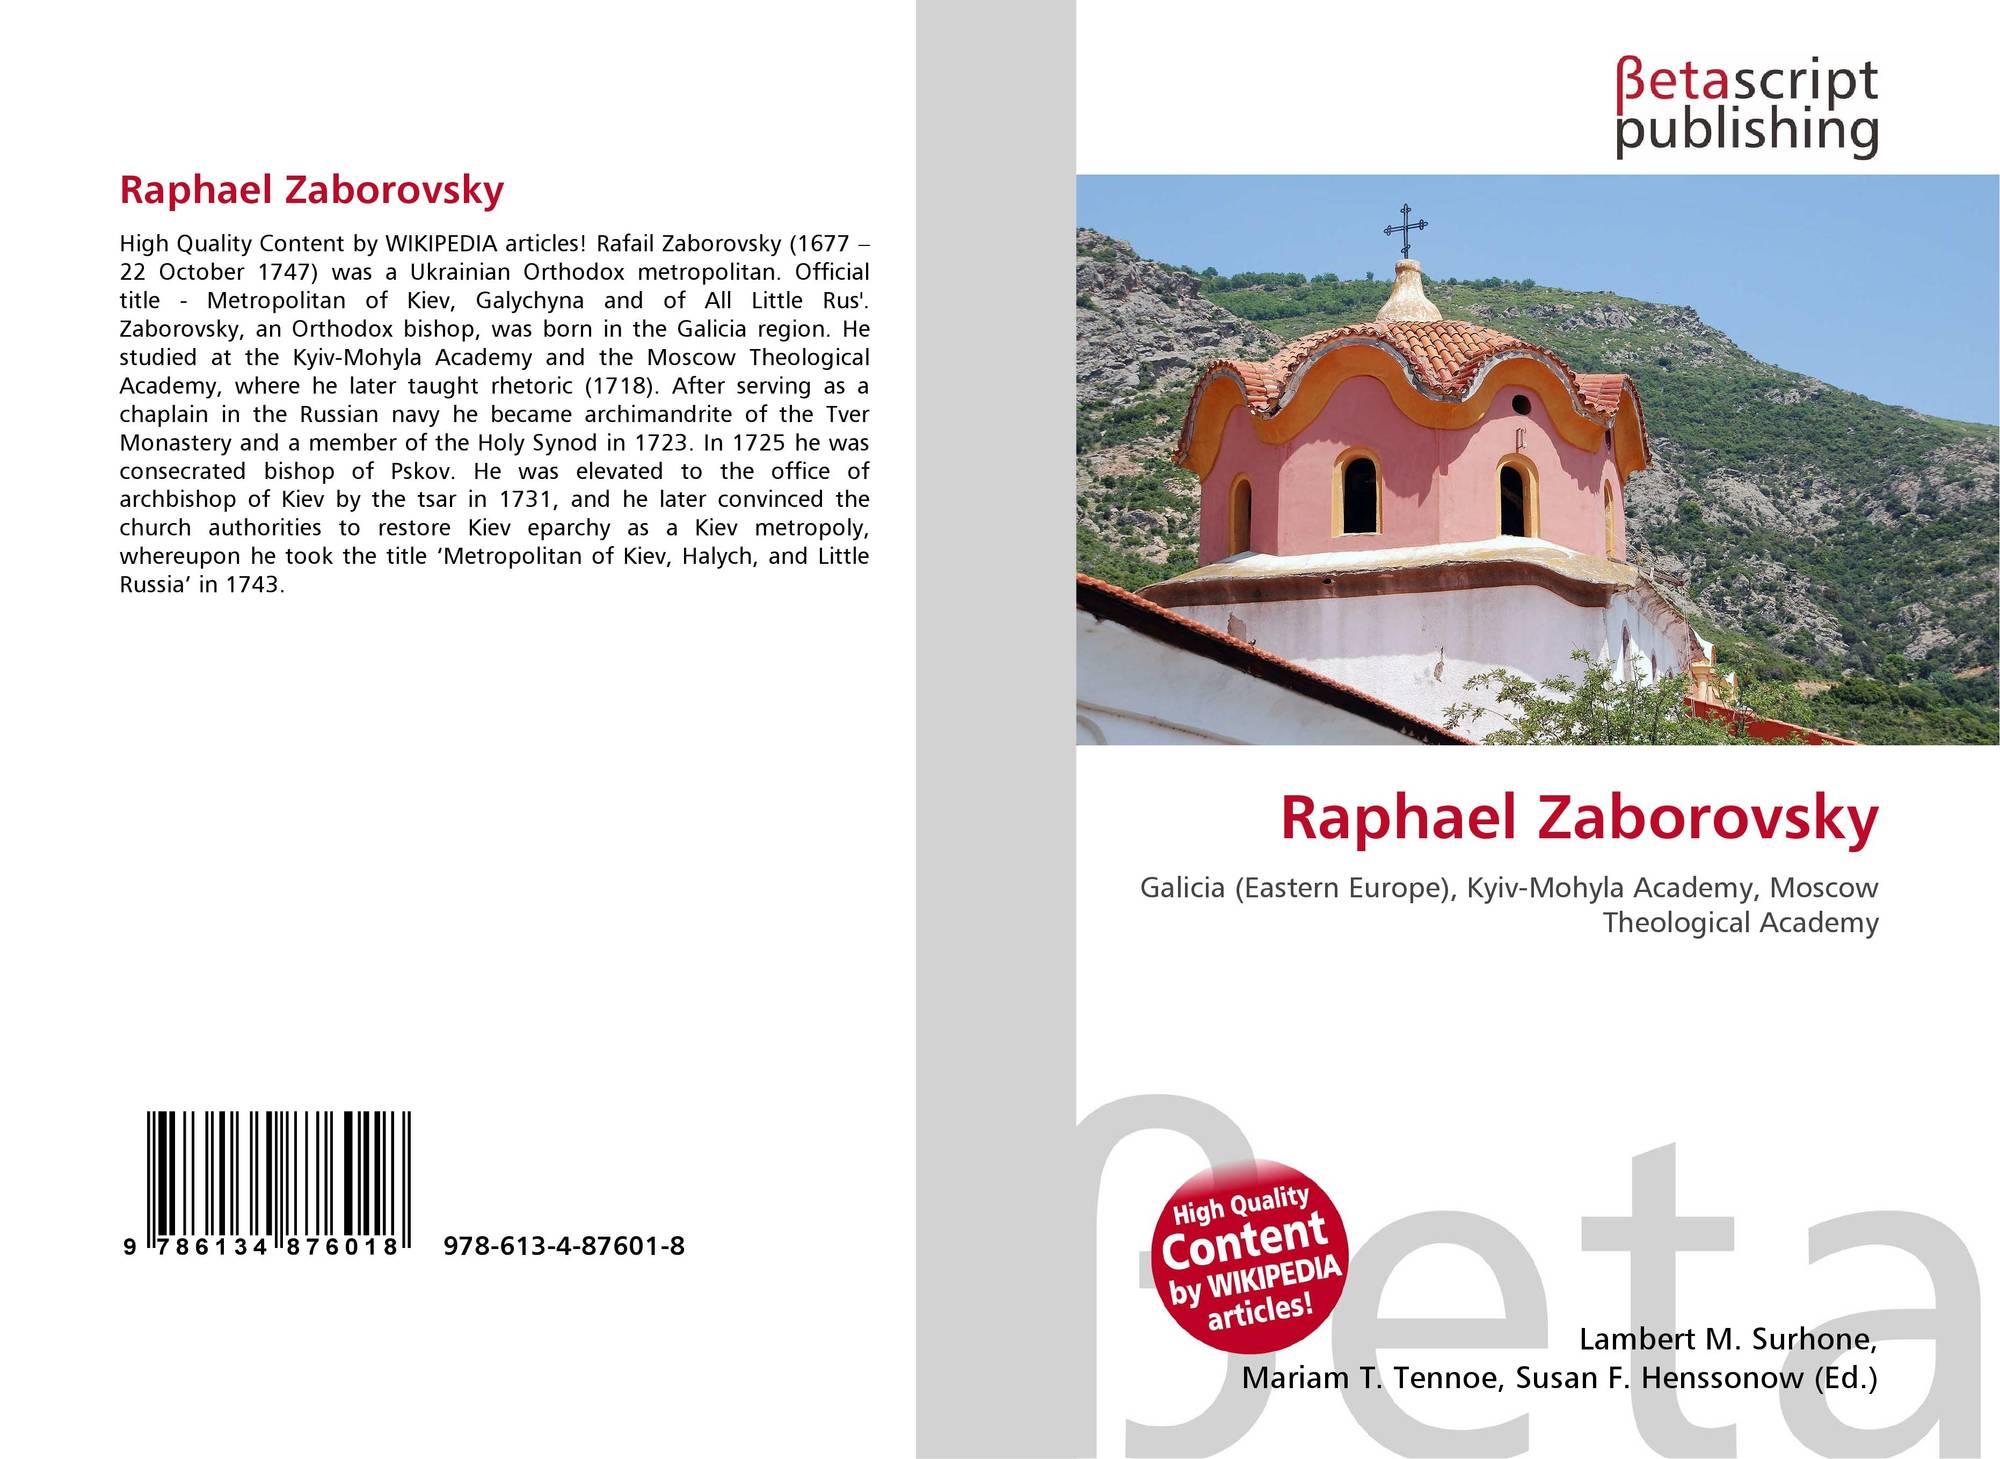 Raphael Zaborovsky, 978-613-4-87601-8, 6134876011 ,9786134876018